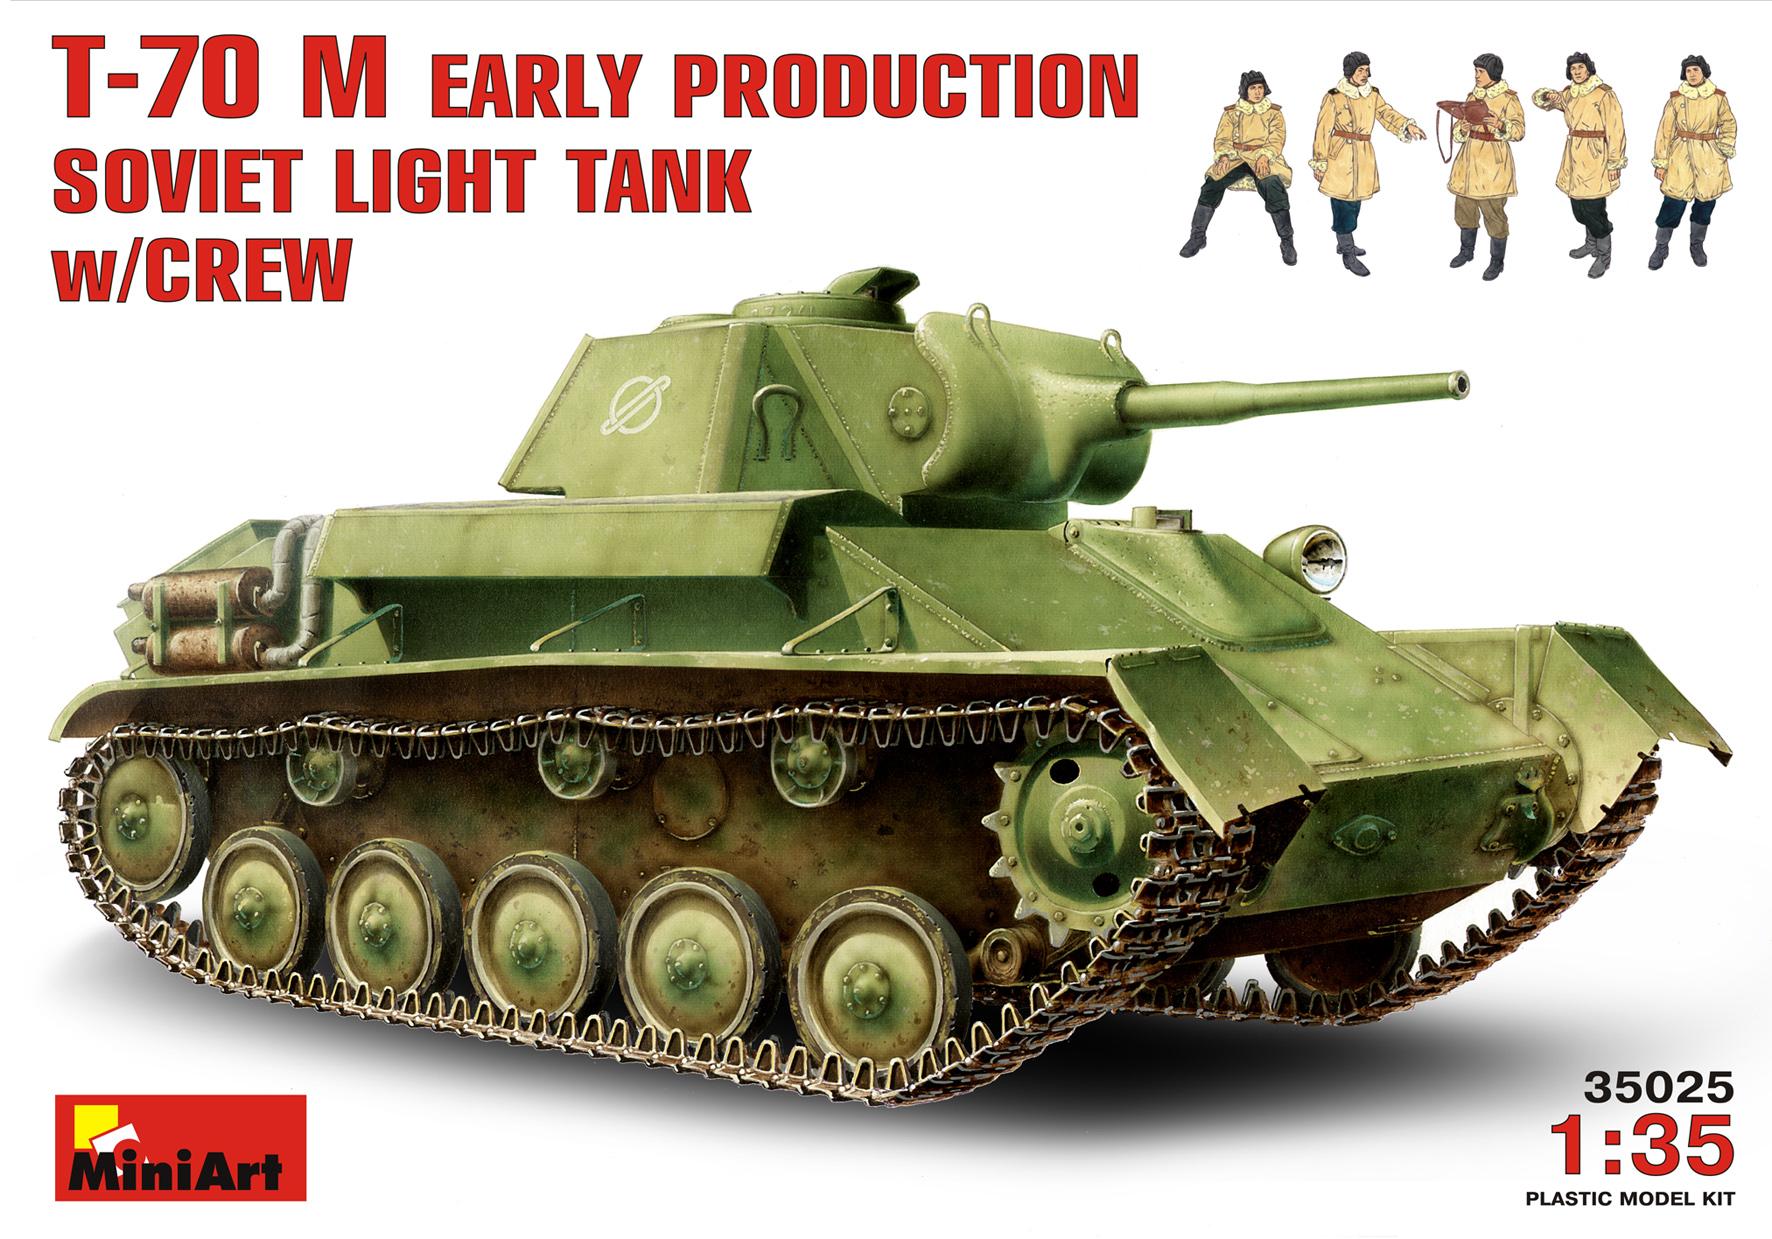 T-70M EARLY PRODUCTION SOVIET LIGHT TANK w/CREW